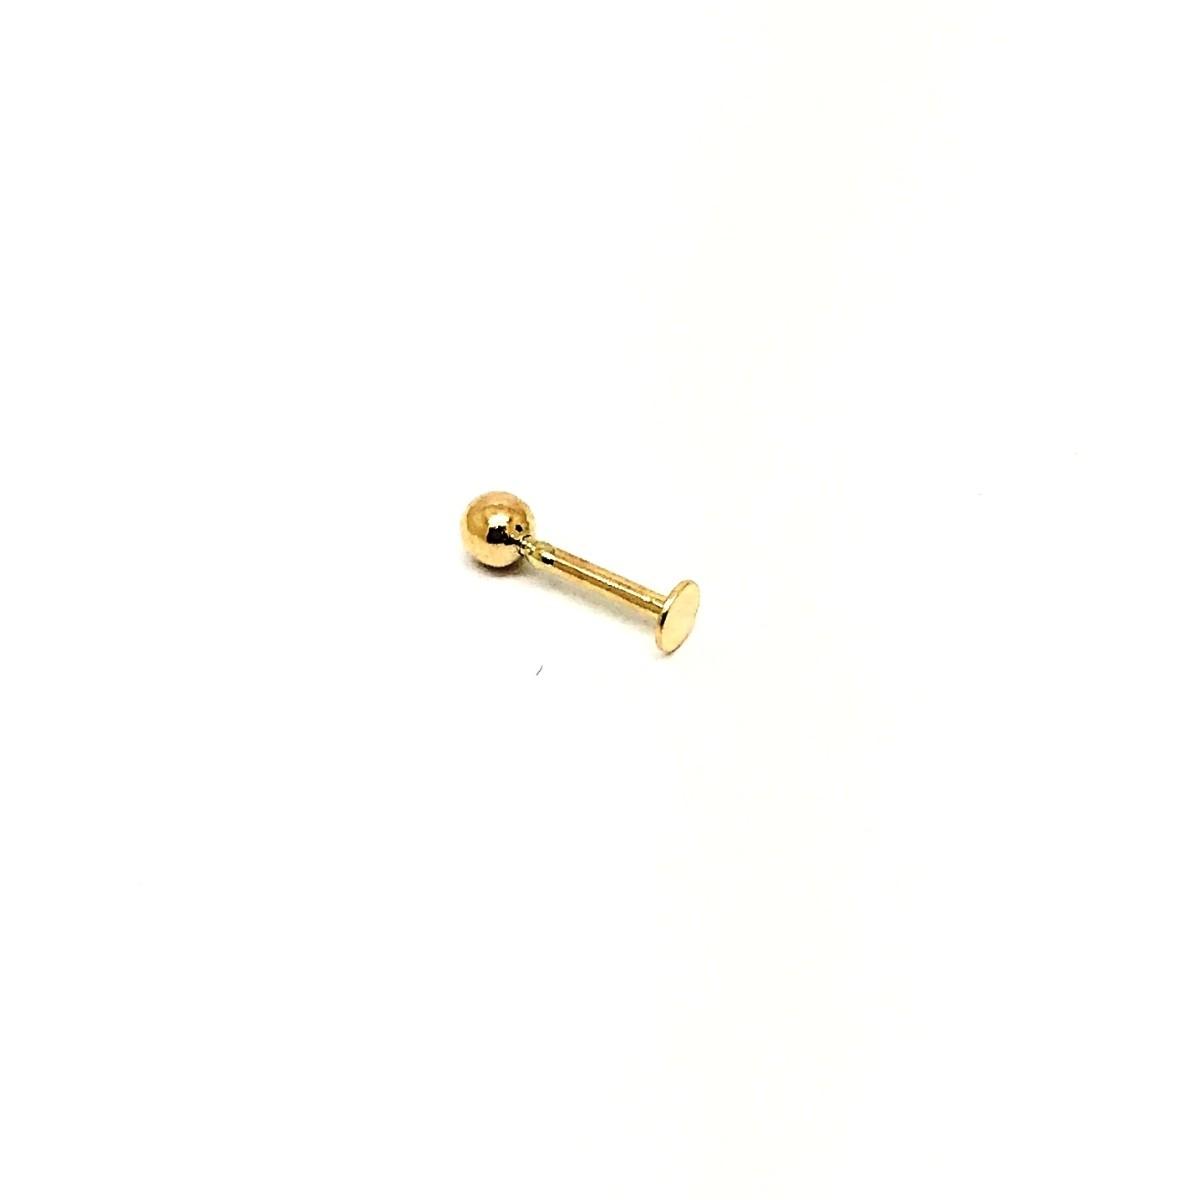 Piercing Labret Bolinha Placa 3 Milimetros Ouro 18K Lto K025 25721